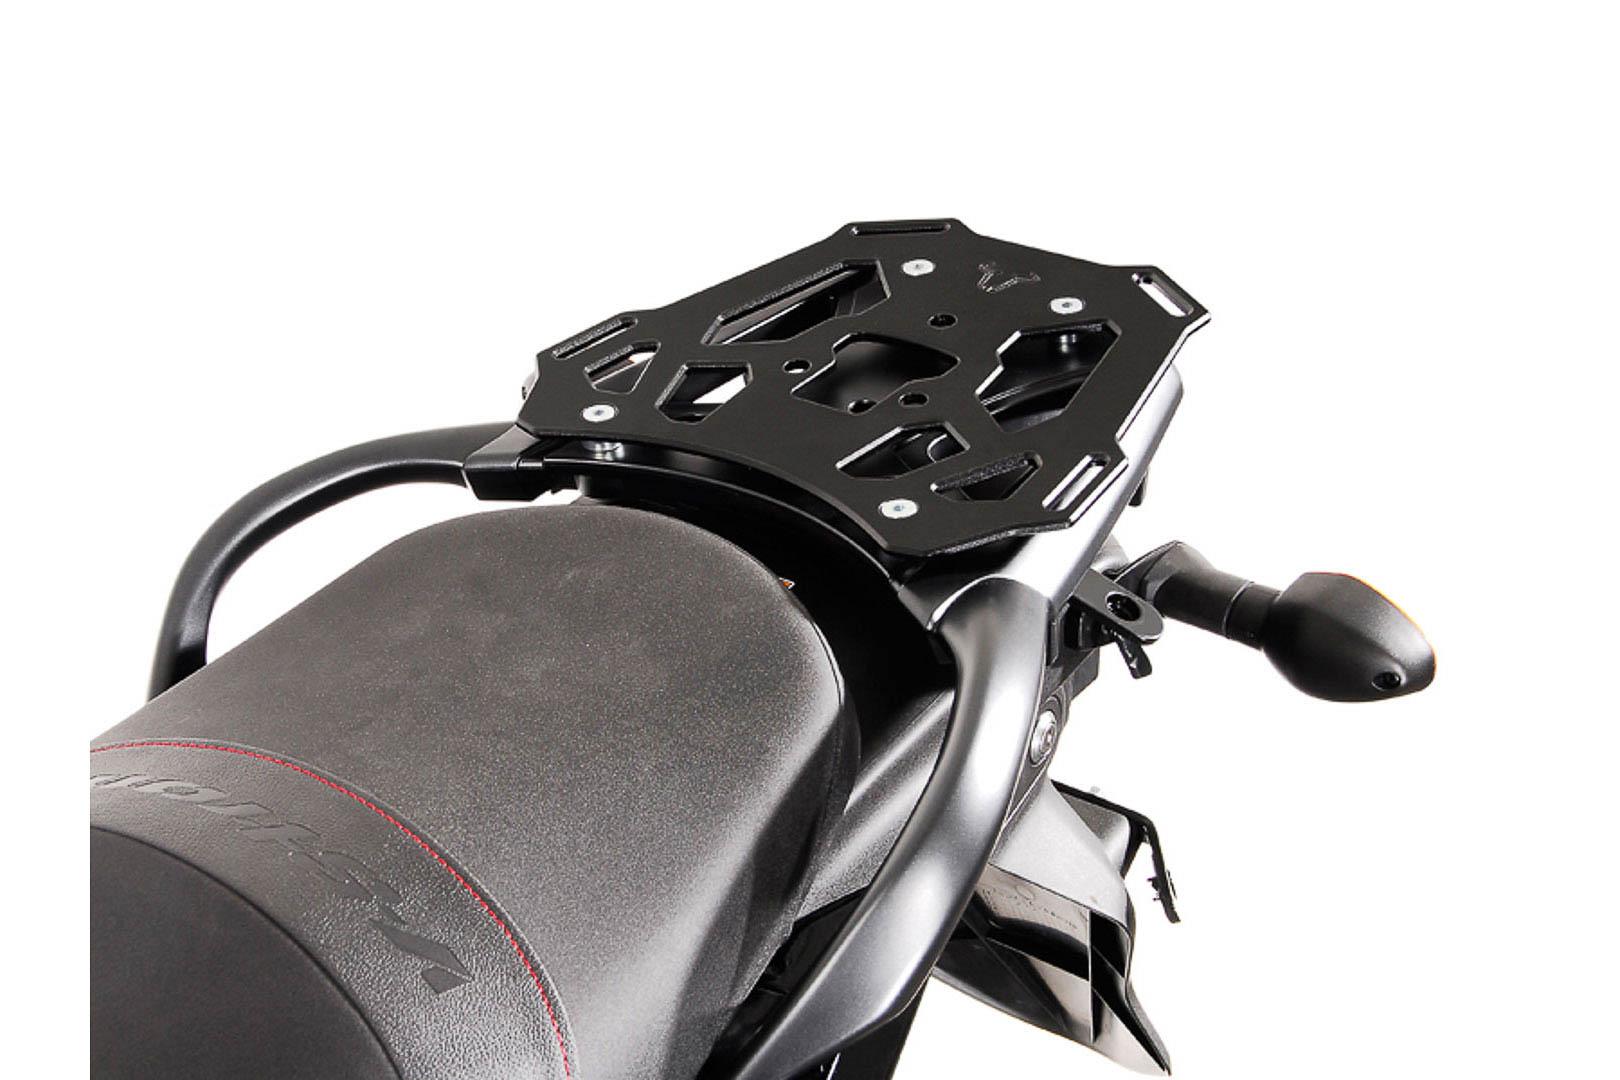 SW-Motech Alu-Rack peräteline Suzuki DL650 V-Strom 11- musta